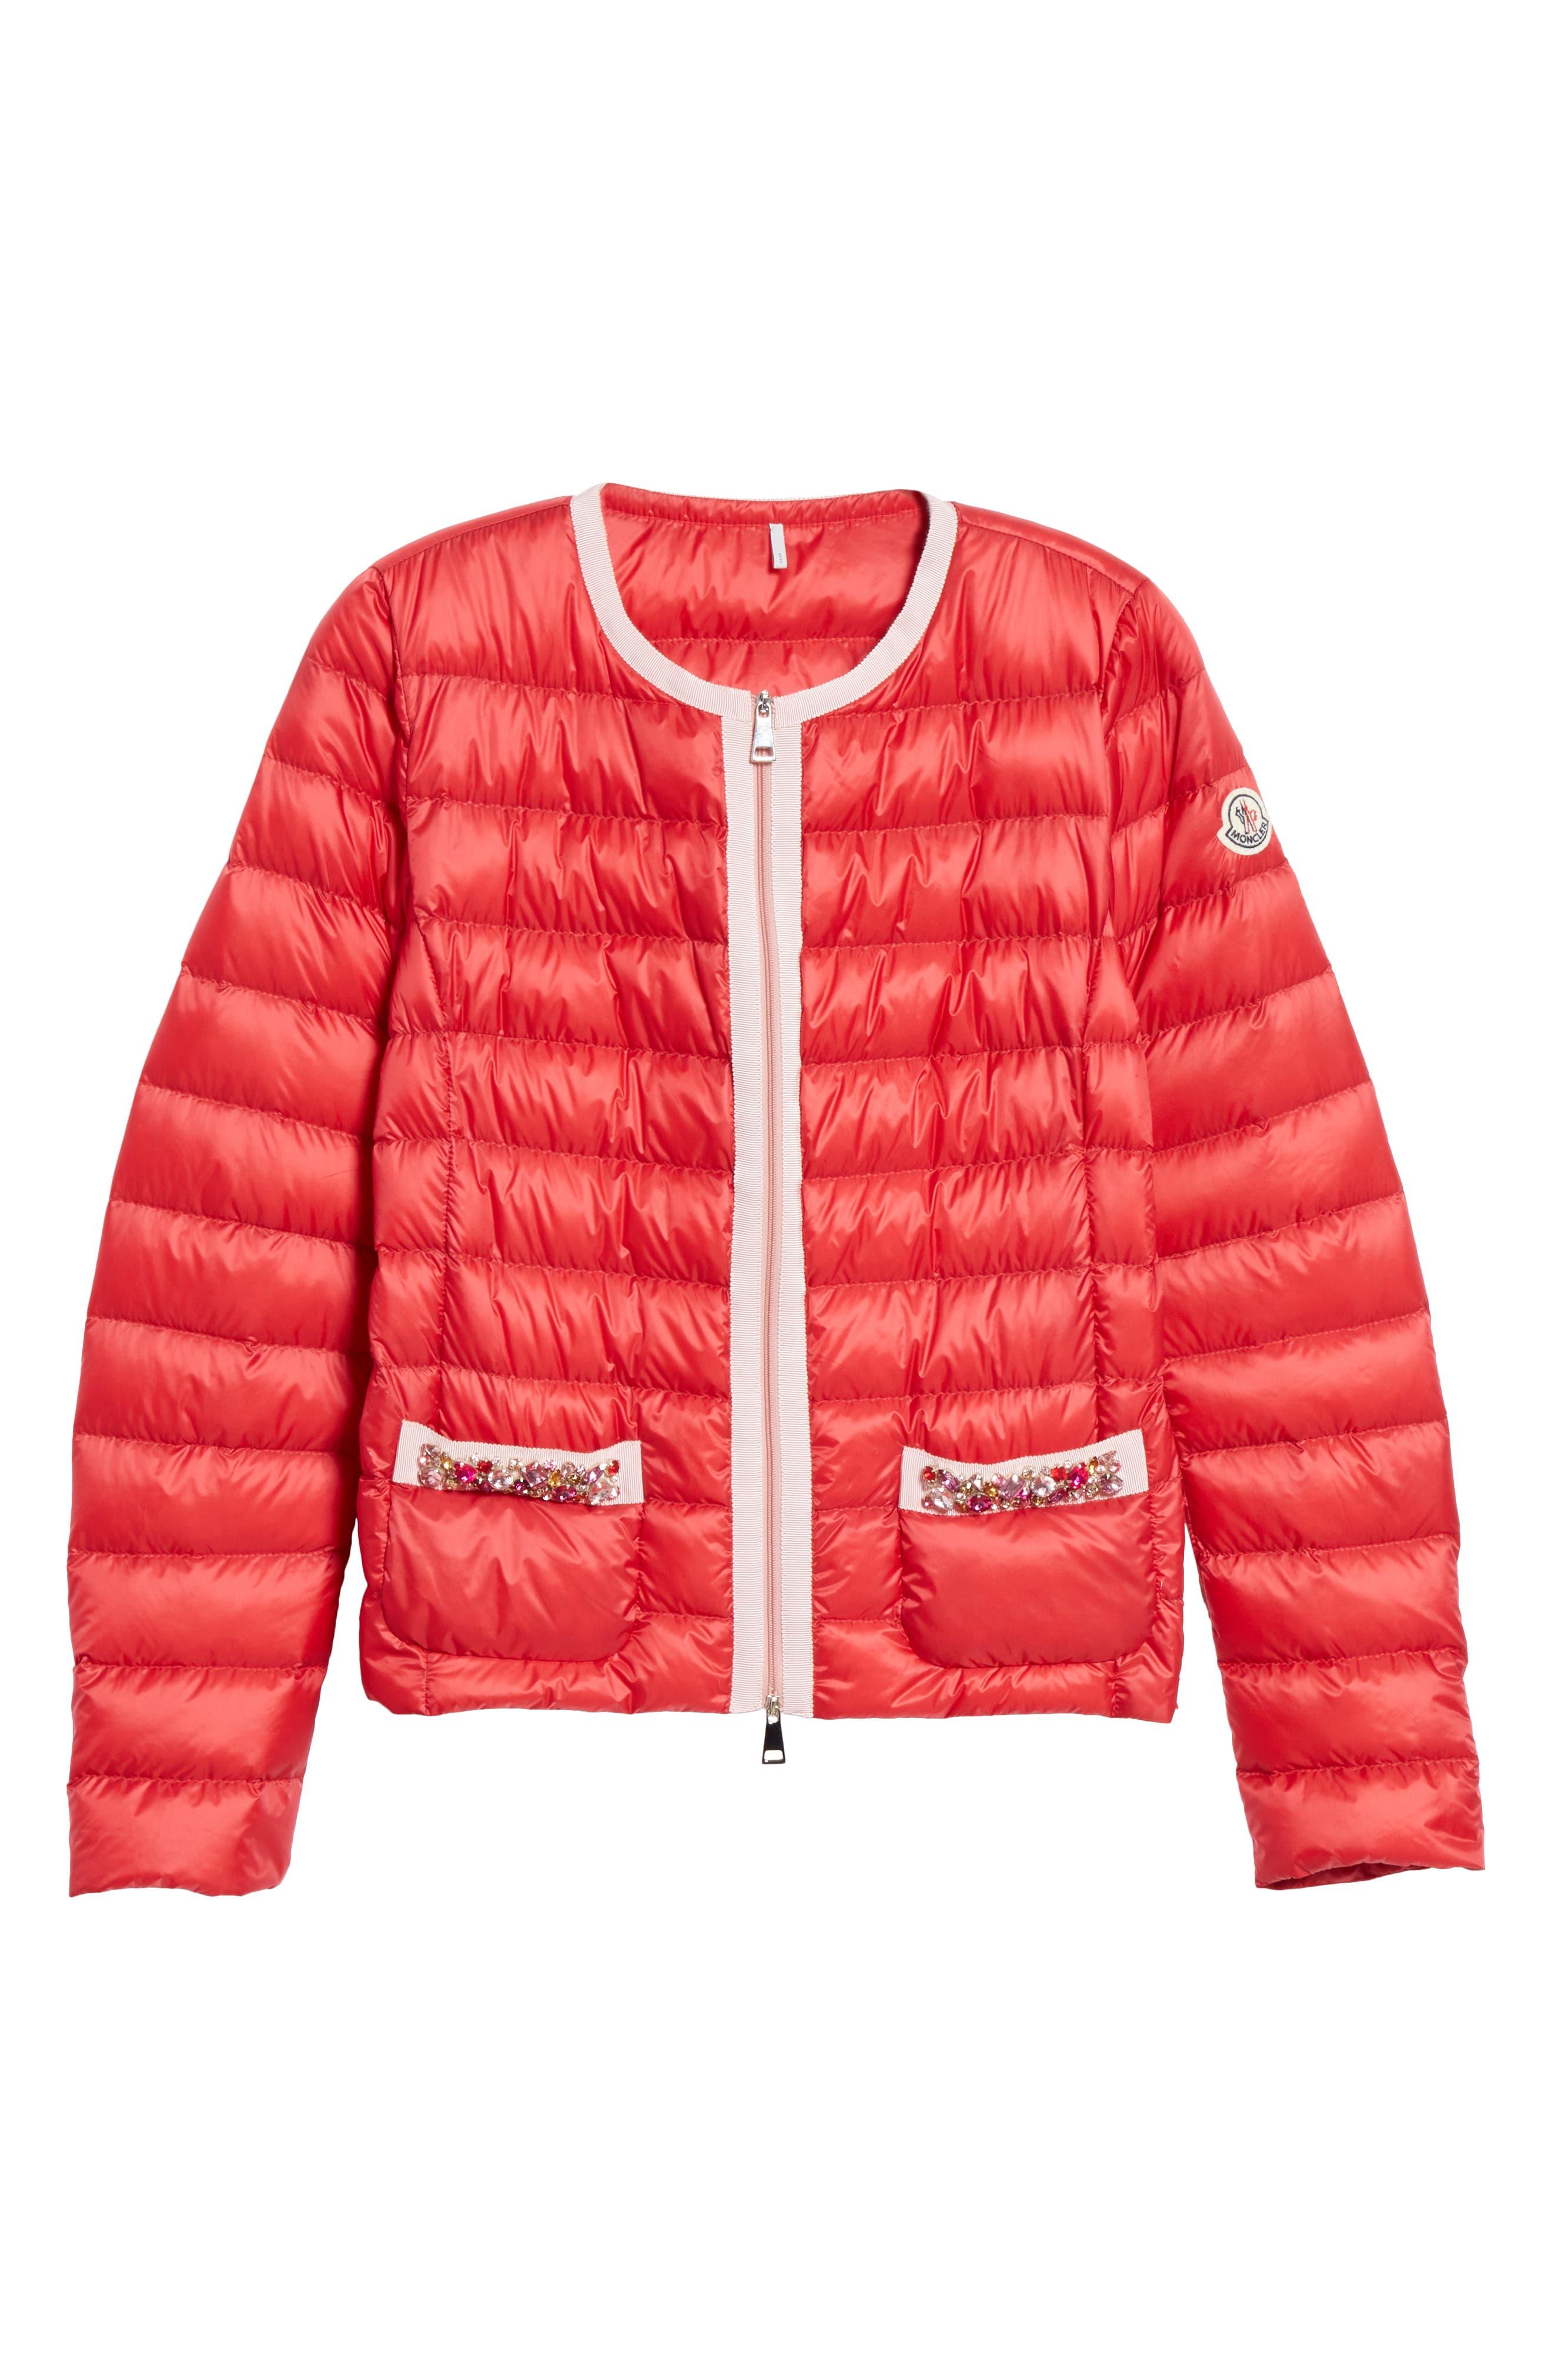 MONCLER, Cristalline Jacket, Alternate thumbnail 6, color, RED